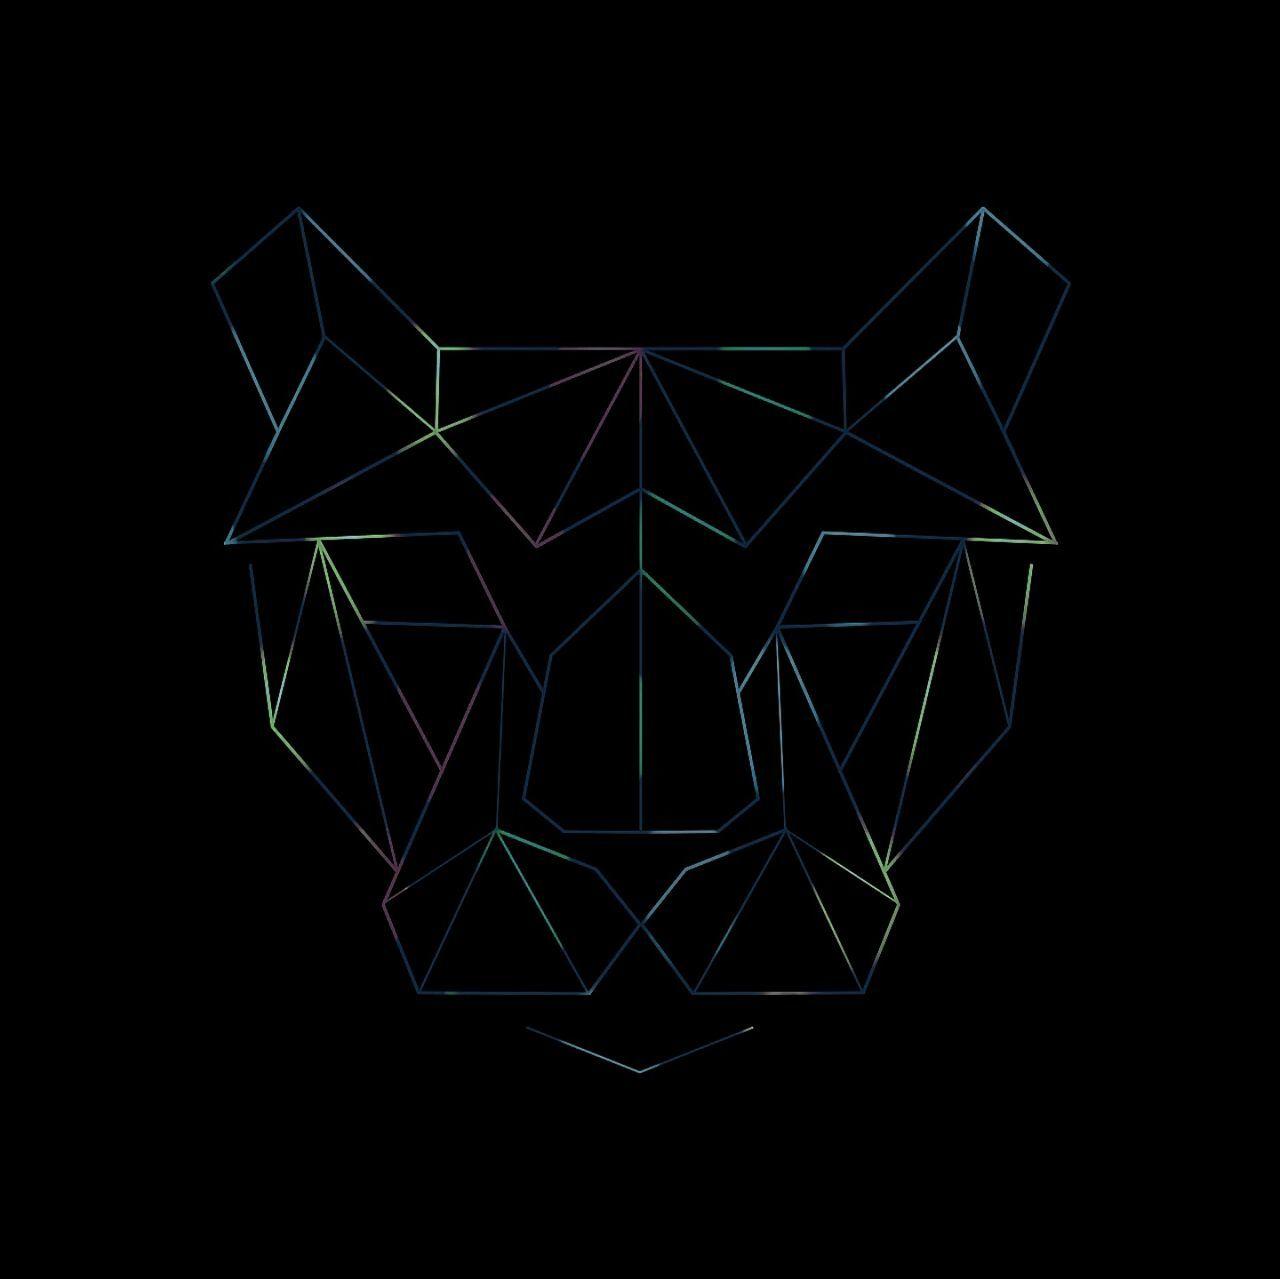 geometric shape, symmetry, black background, night, pattern, abstract, studio shot, black color, no people, illuminated, blue, geometry, close-up